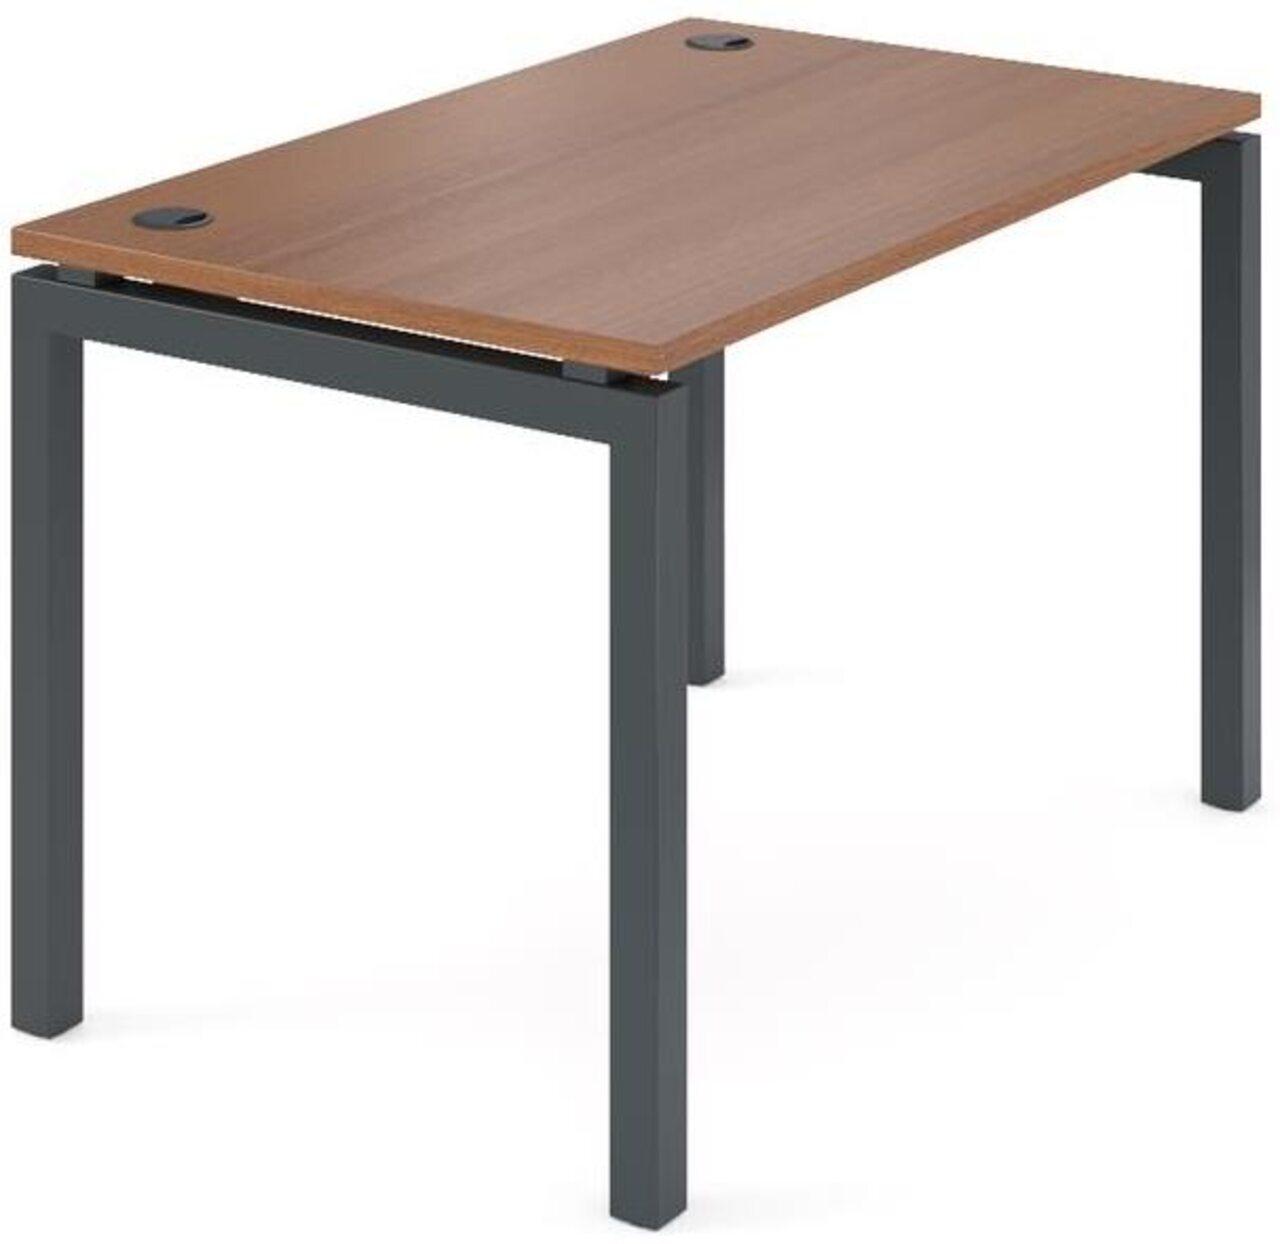 Стол на металлокаркасе  Арго 120x73x76 - фото 3